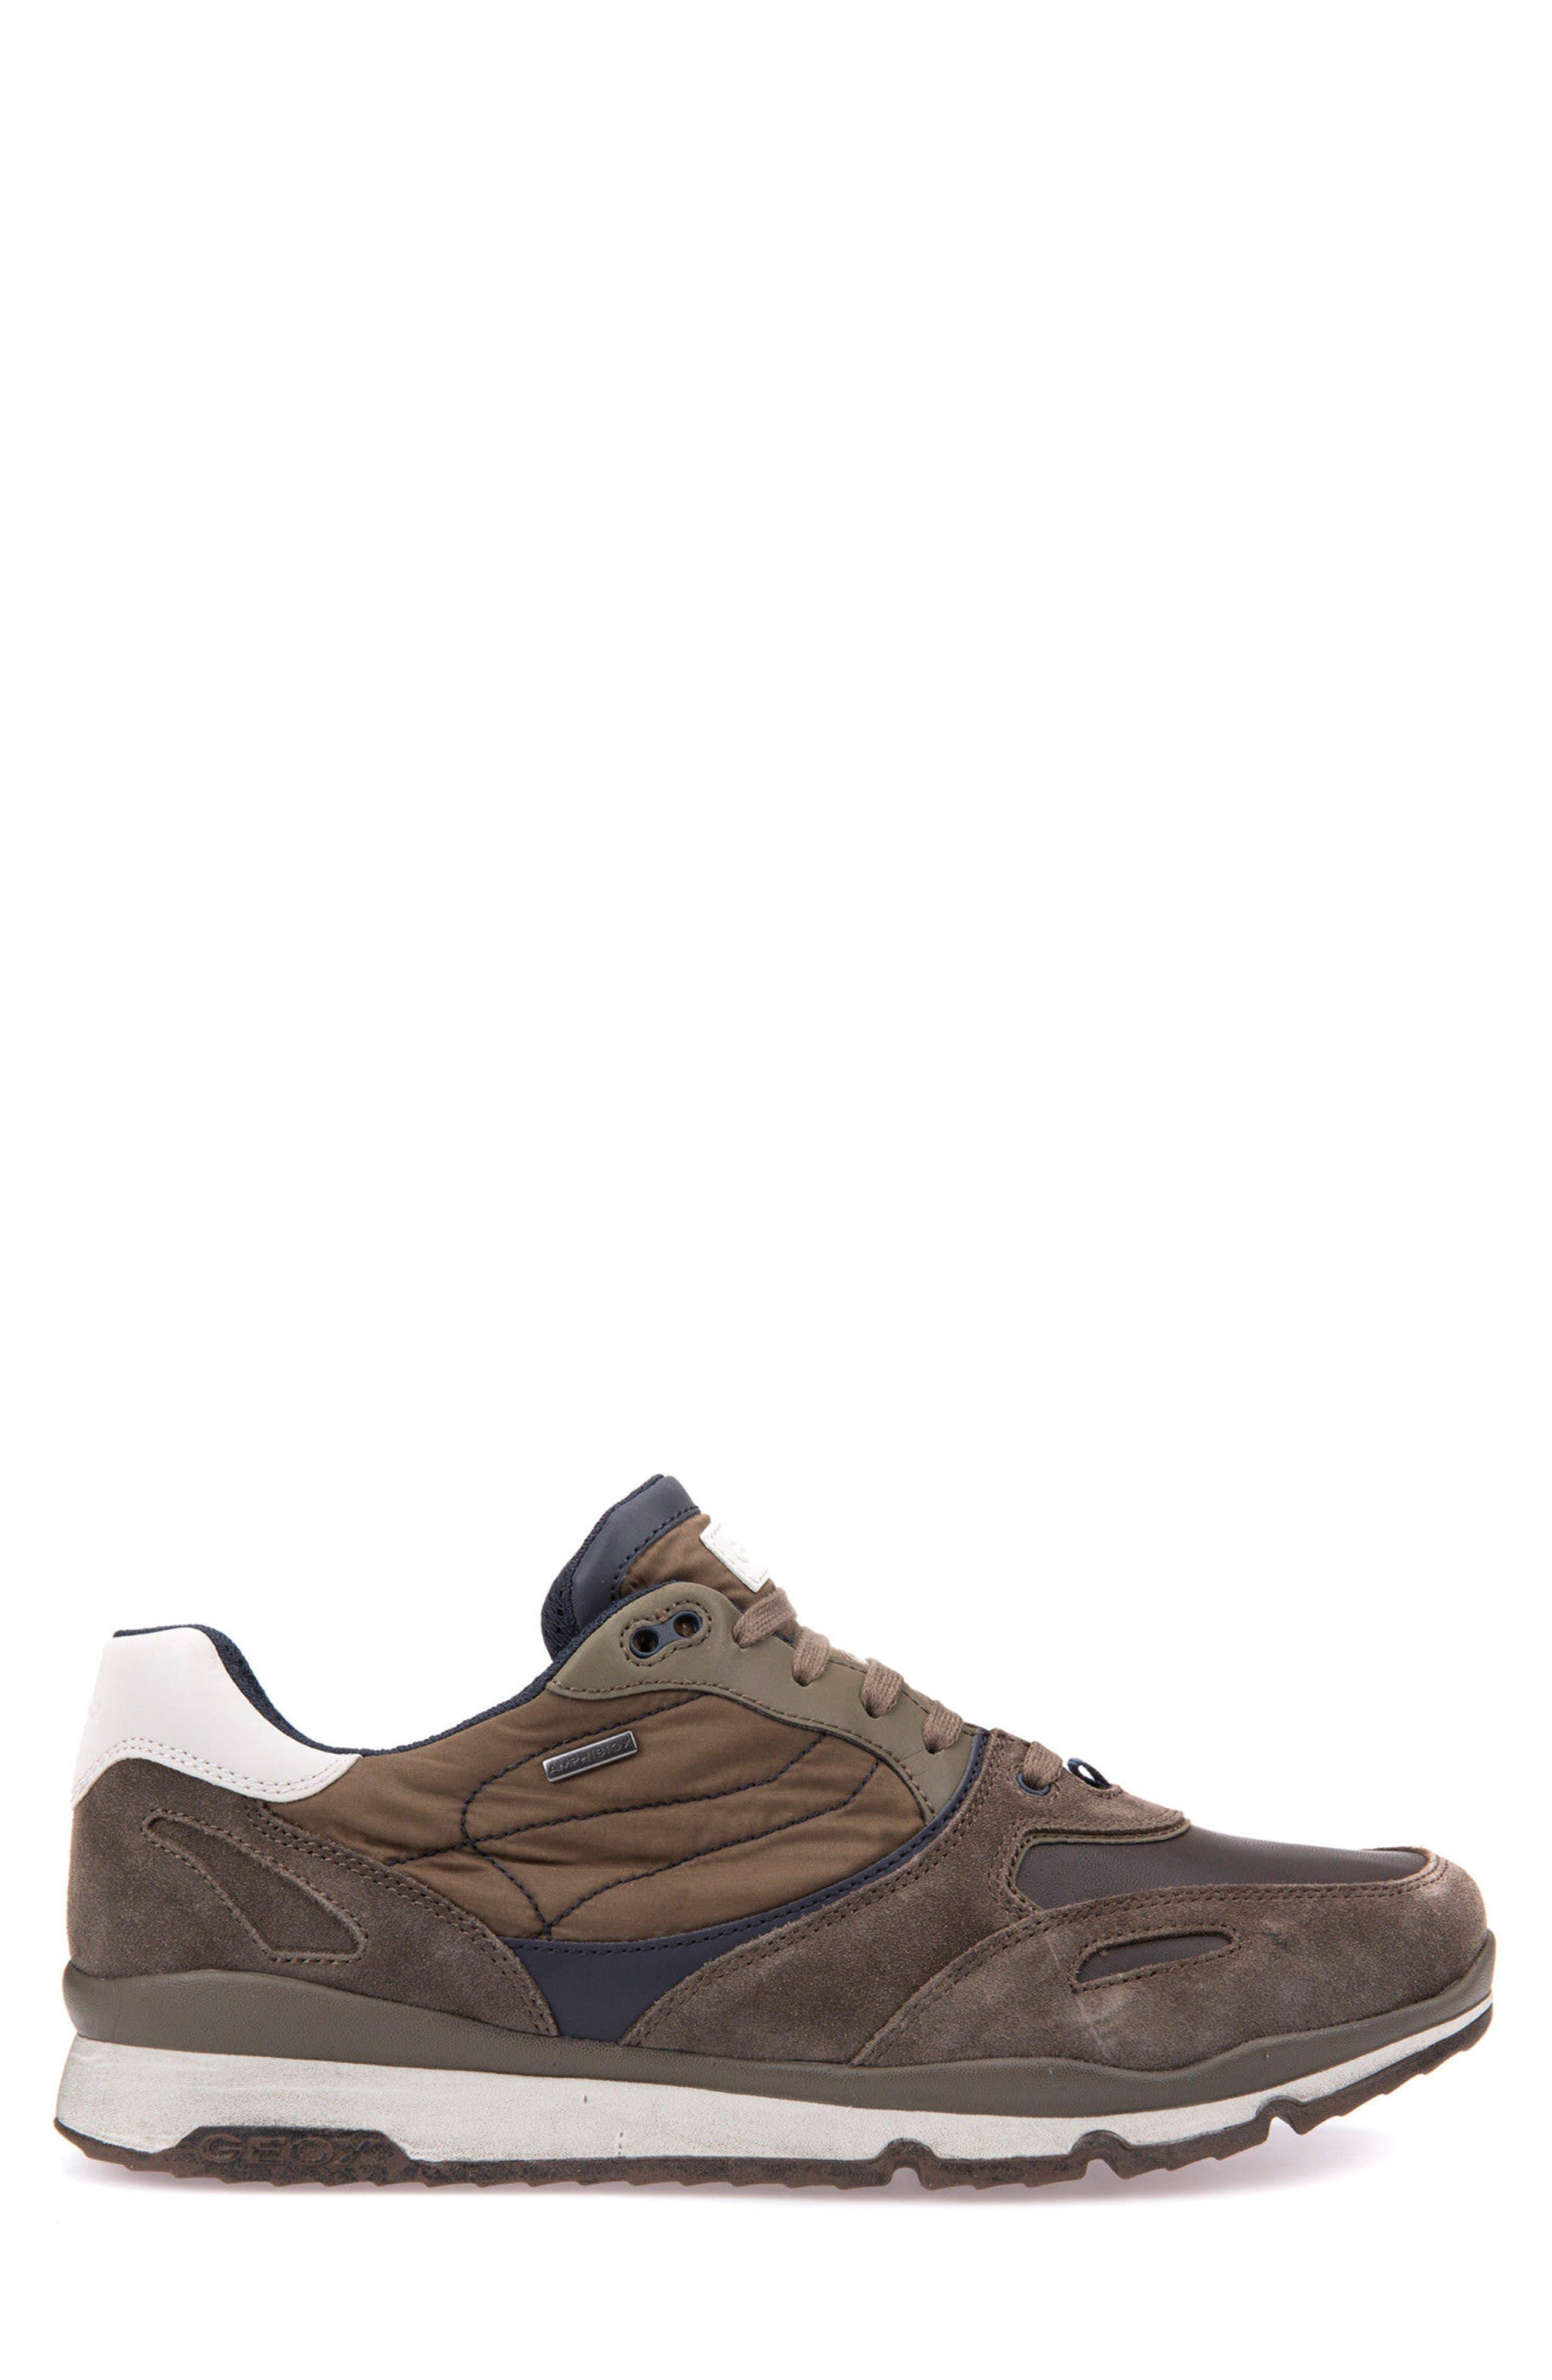 Sandro ABX Ambphibiox Waterproof Sneaker,                             Alternate thumbnail 3, color,                             Taupe